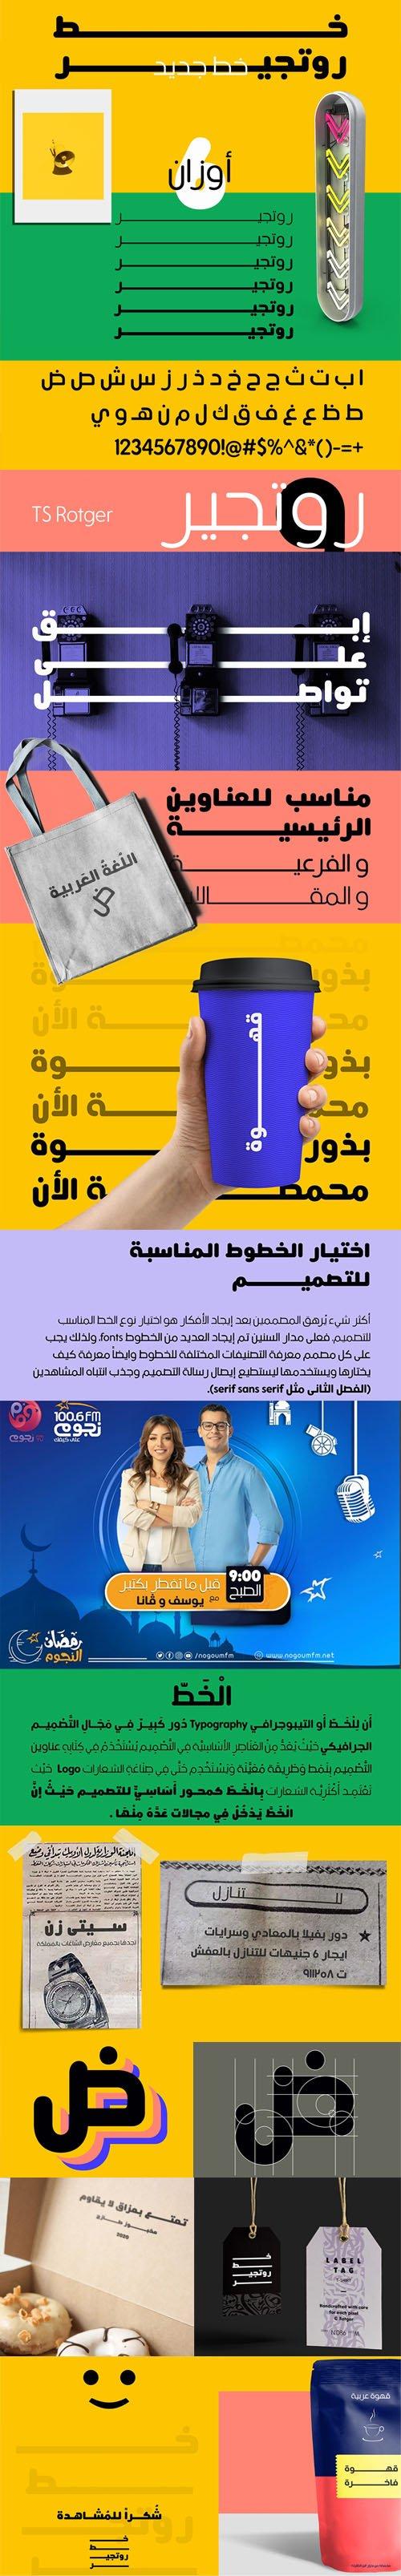 Rotger Arabic Sans Serif Typeface [4-Weights]